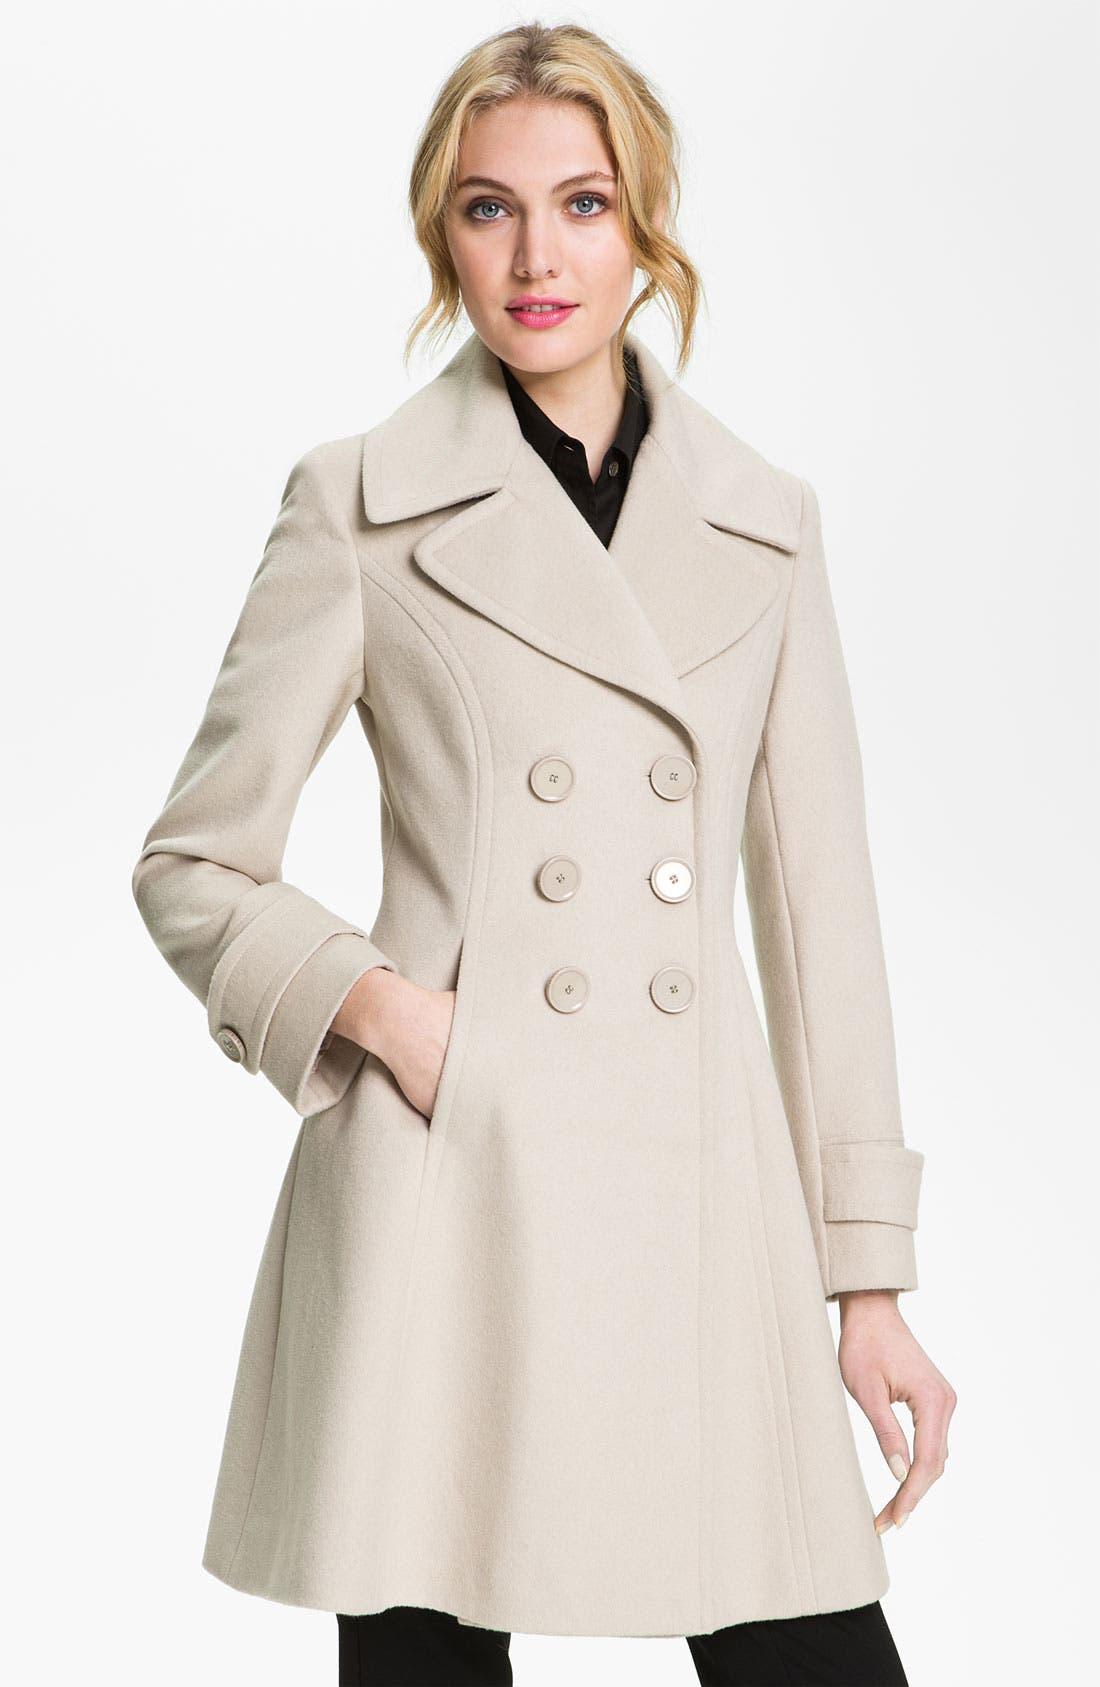 Alternate Image 1 Selected - T Tahari 'Darla' Wool Blend Fit & Flare Coat (Online Only)